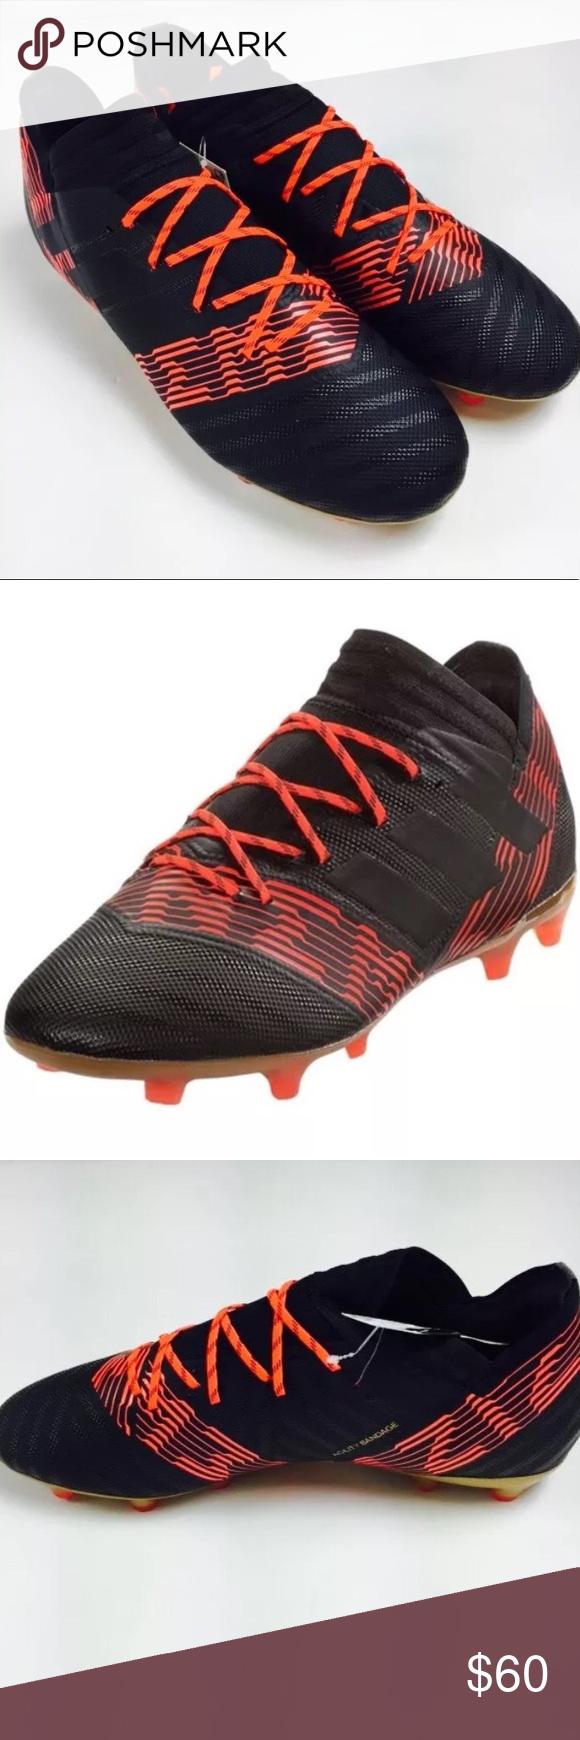 6d736ea3813b Soccer ⚽ Adidas Nemeziz 17.2 FG Cleat Black Solar This is a brand new never  before worn pair of Adidas Nemeziz 17.2 FG Soccer Cleats in Black-Solar-Red  ...